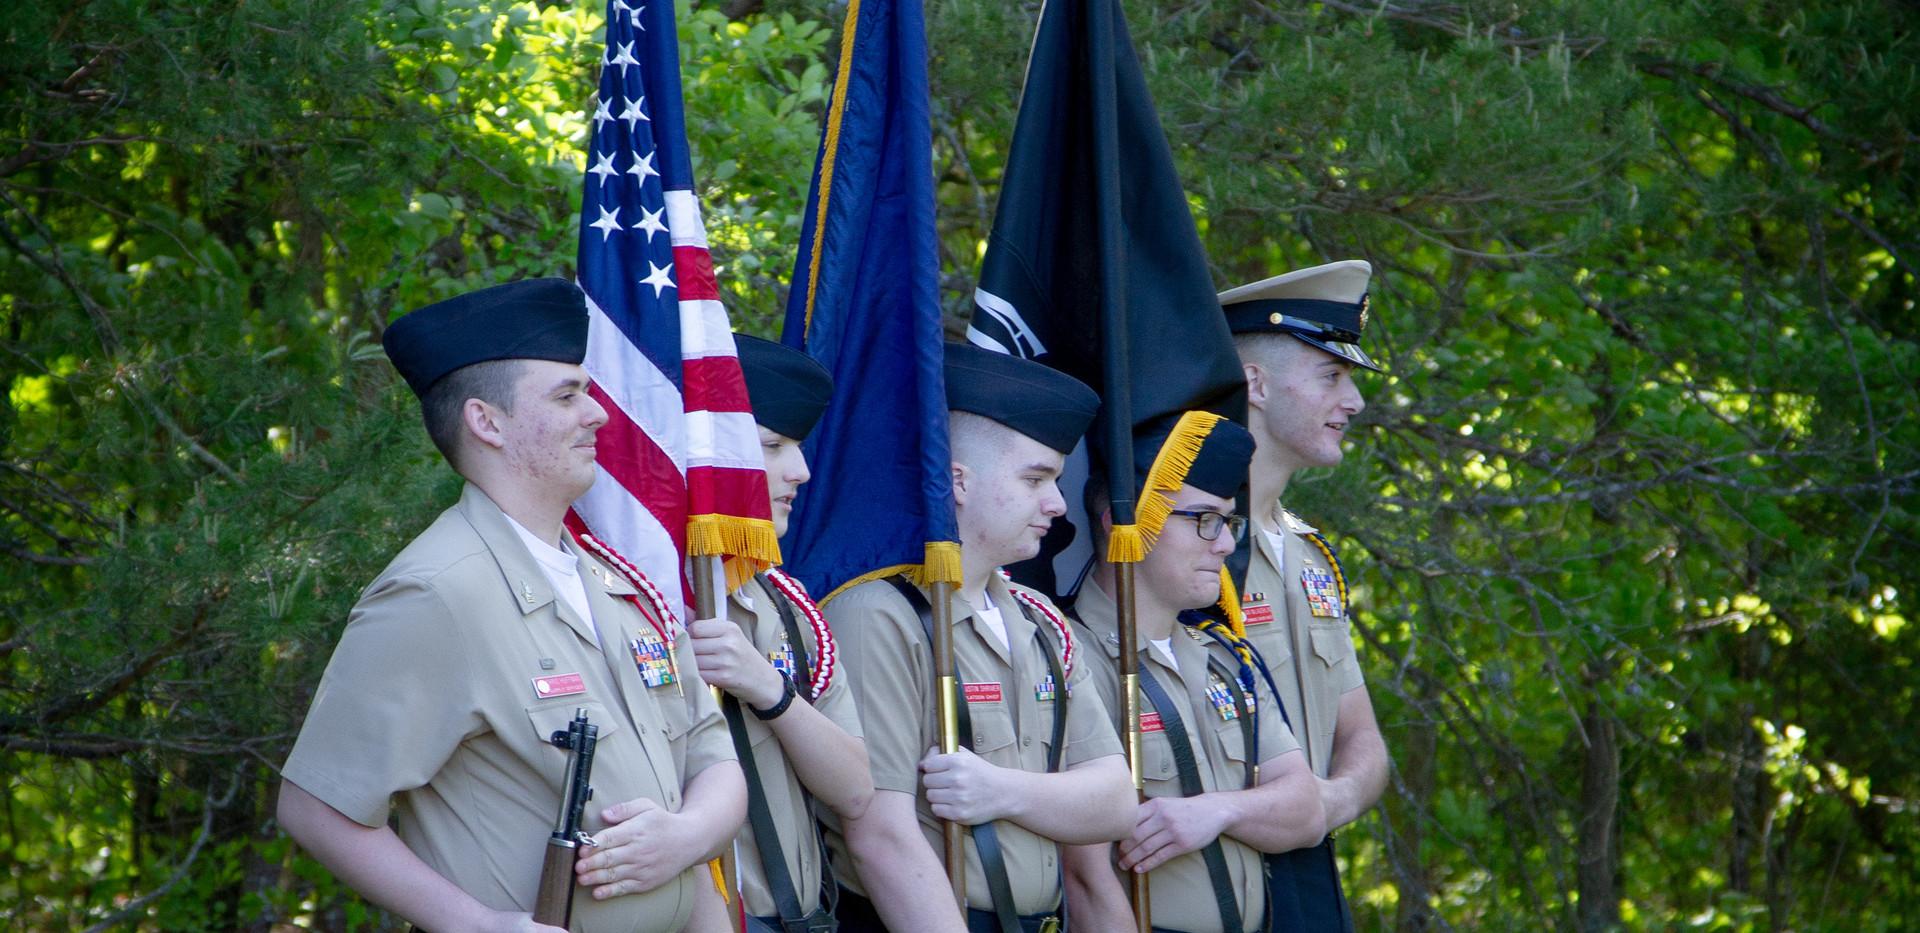 VeteransGarden_025.jpg